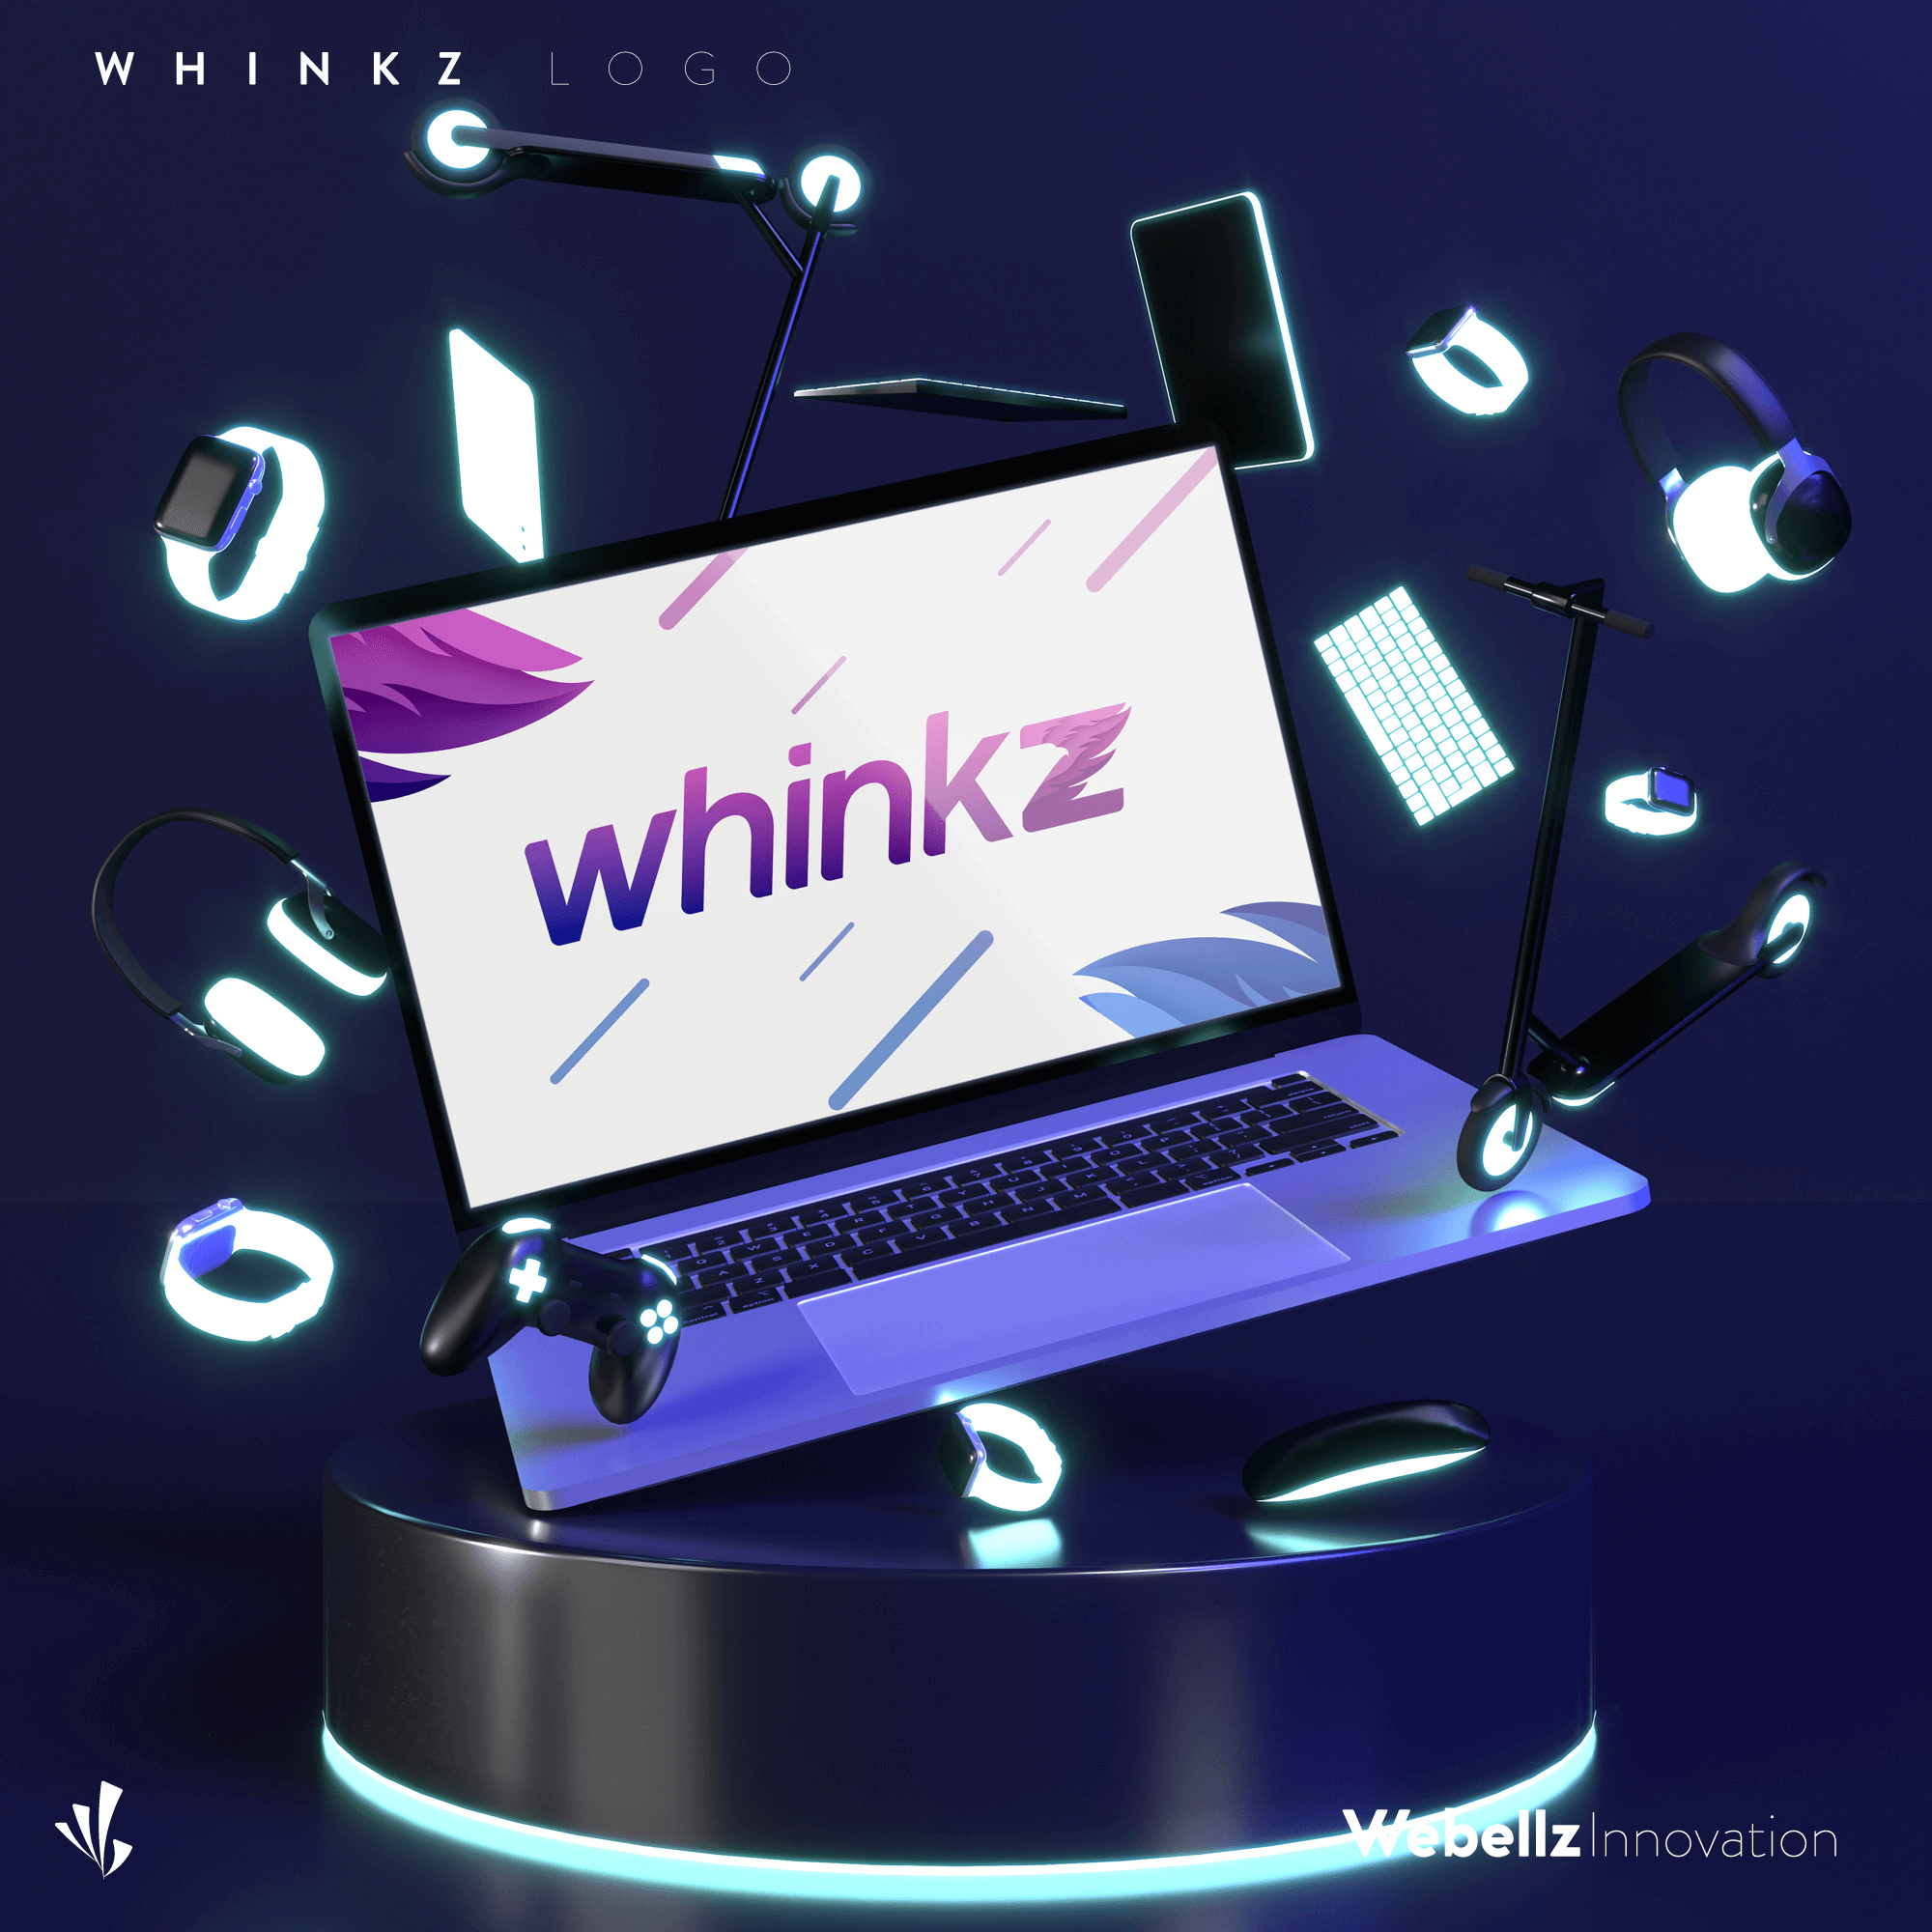 Whinkz forSM 003 | Logo designer in Coimbatore